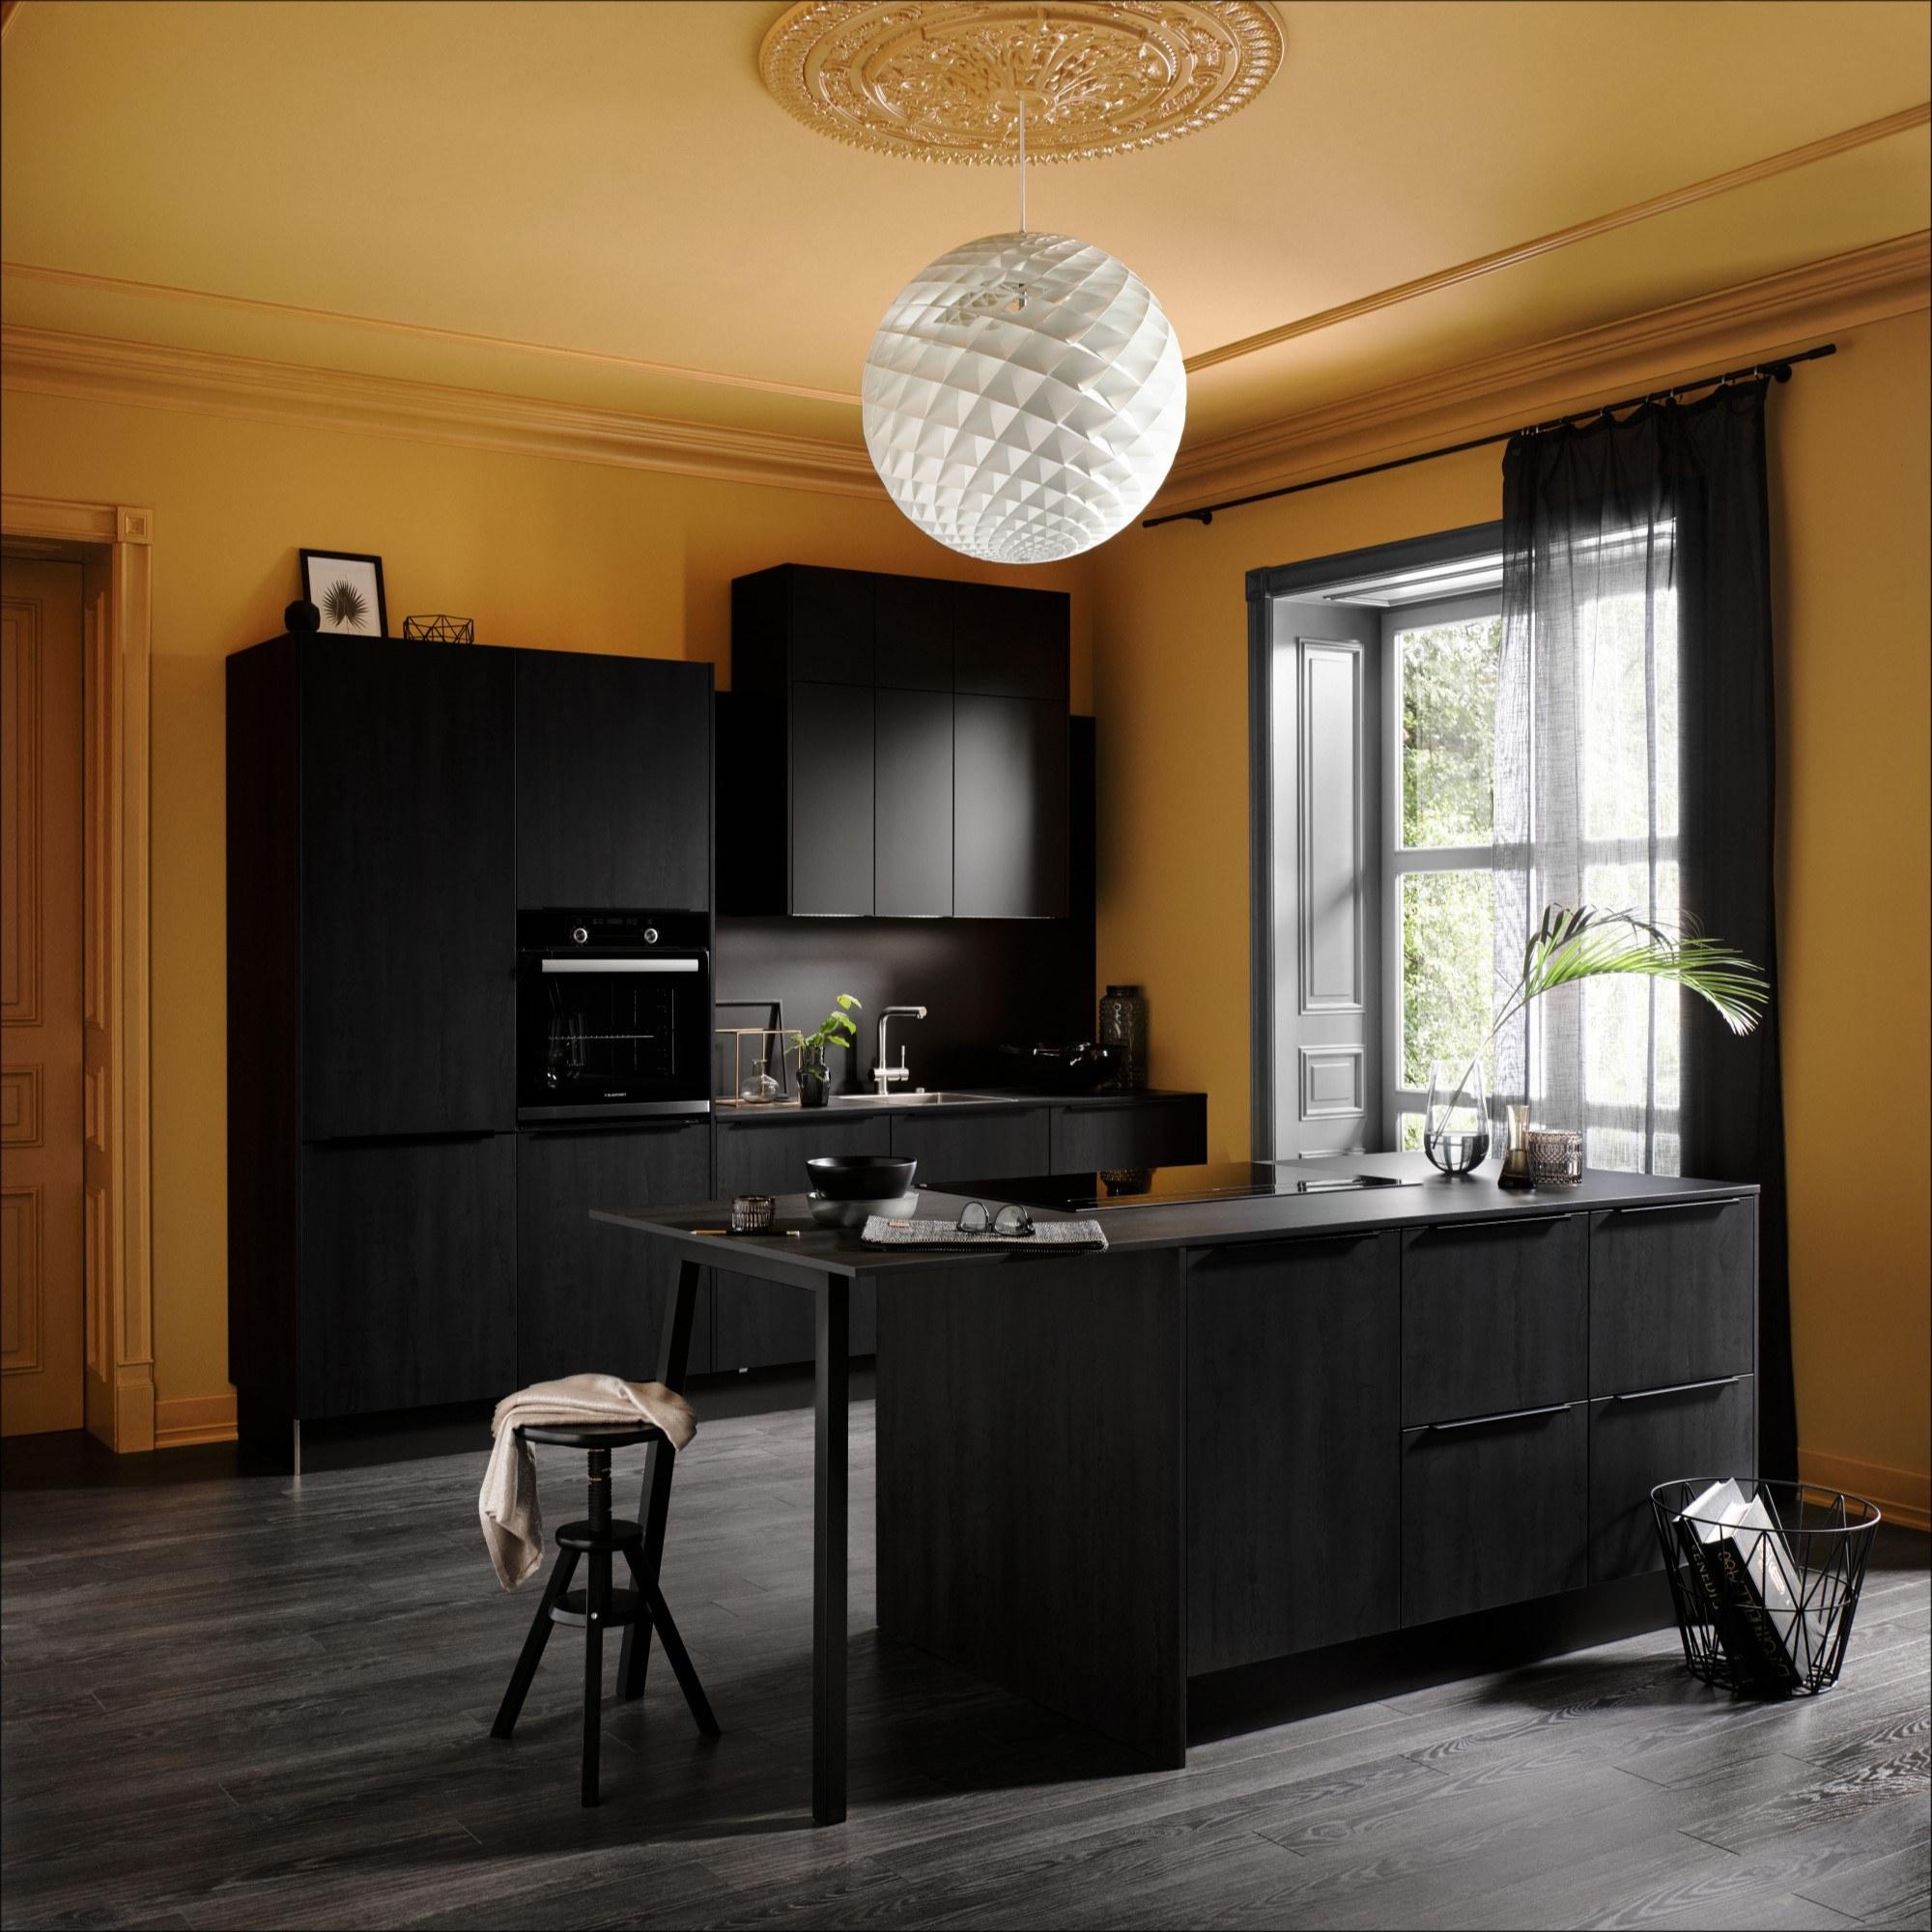 Luxe moderne design keuken in zwart en zwart hout